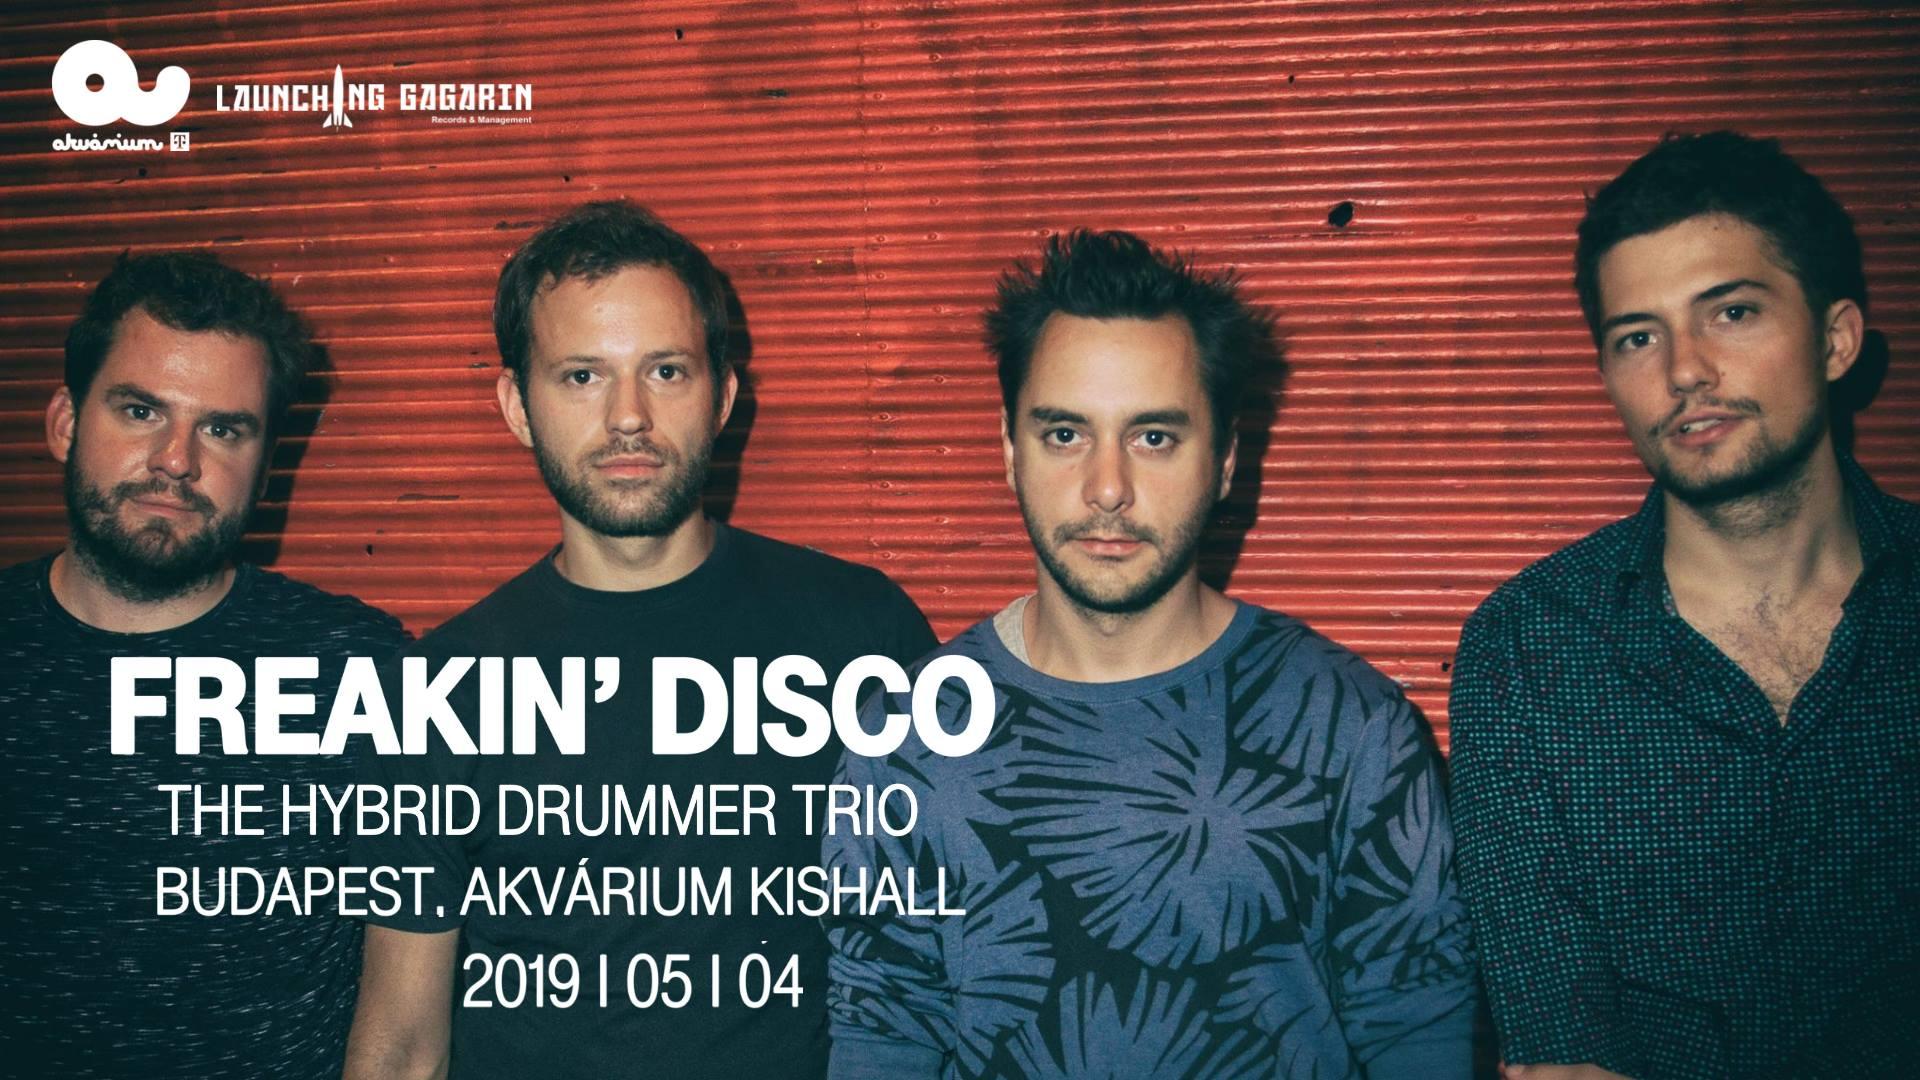 Freakin' Disco Koncert Budapest, Avárium - 2019 május 4.